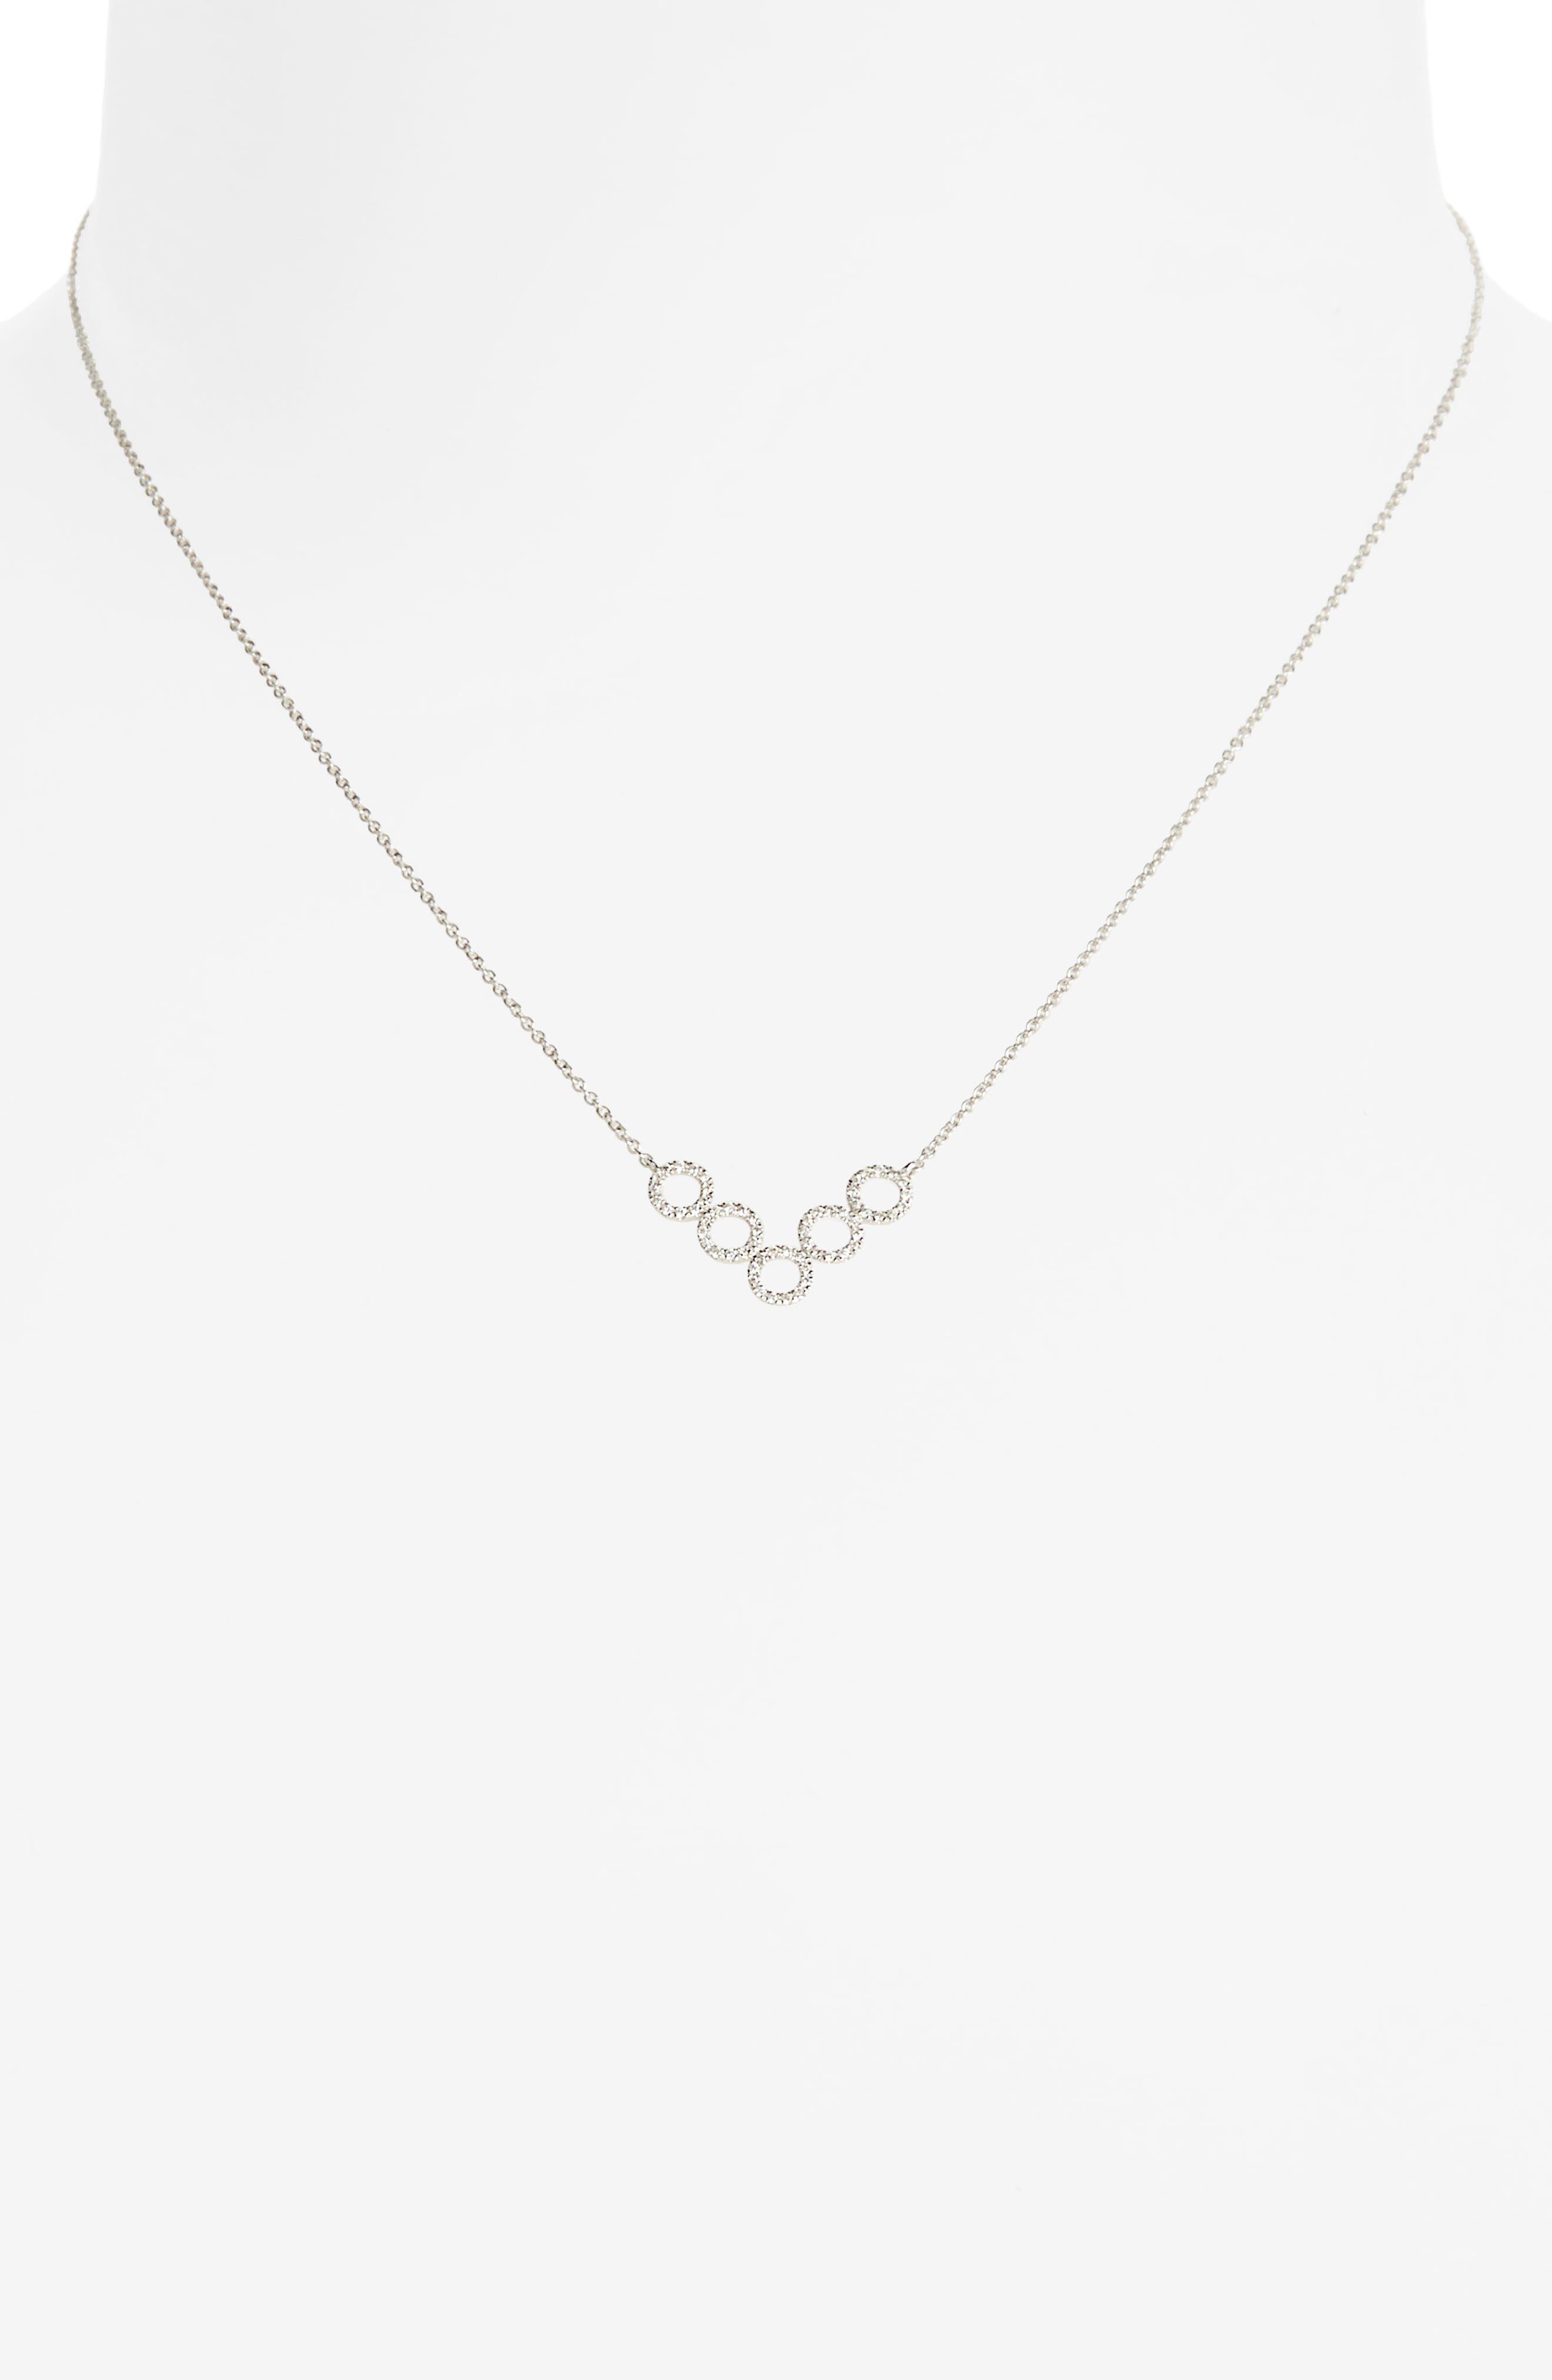 Geometric Circle Pendant Necklace,                             Main thumbnail 1, color,                             White Gold